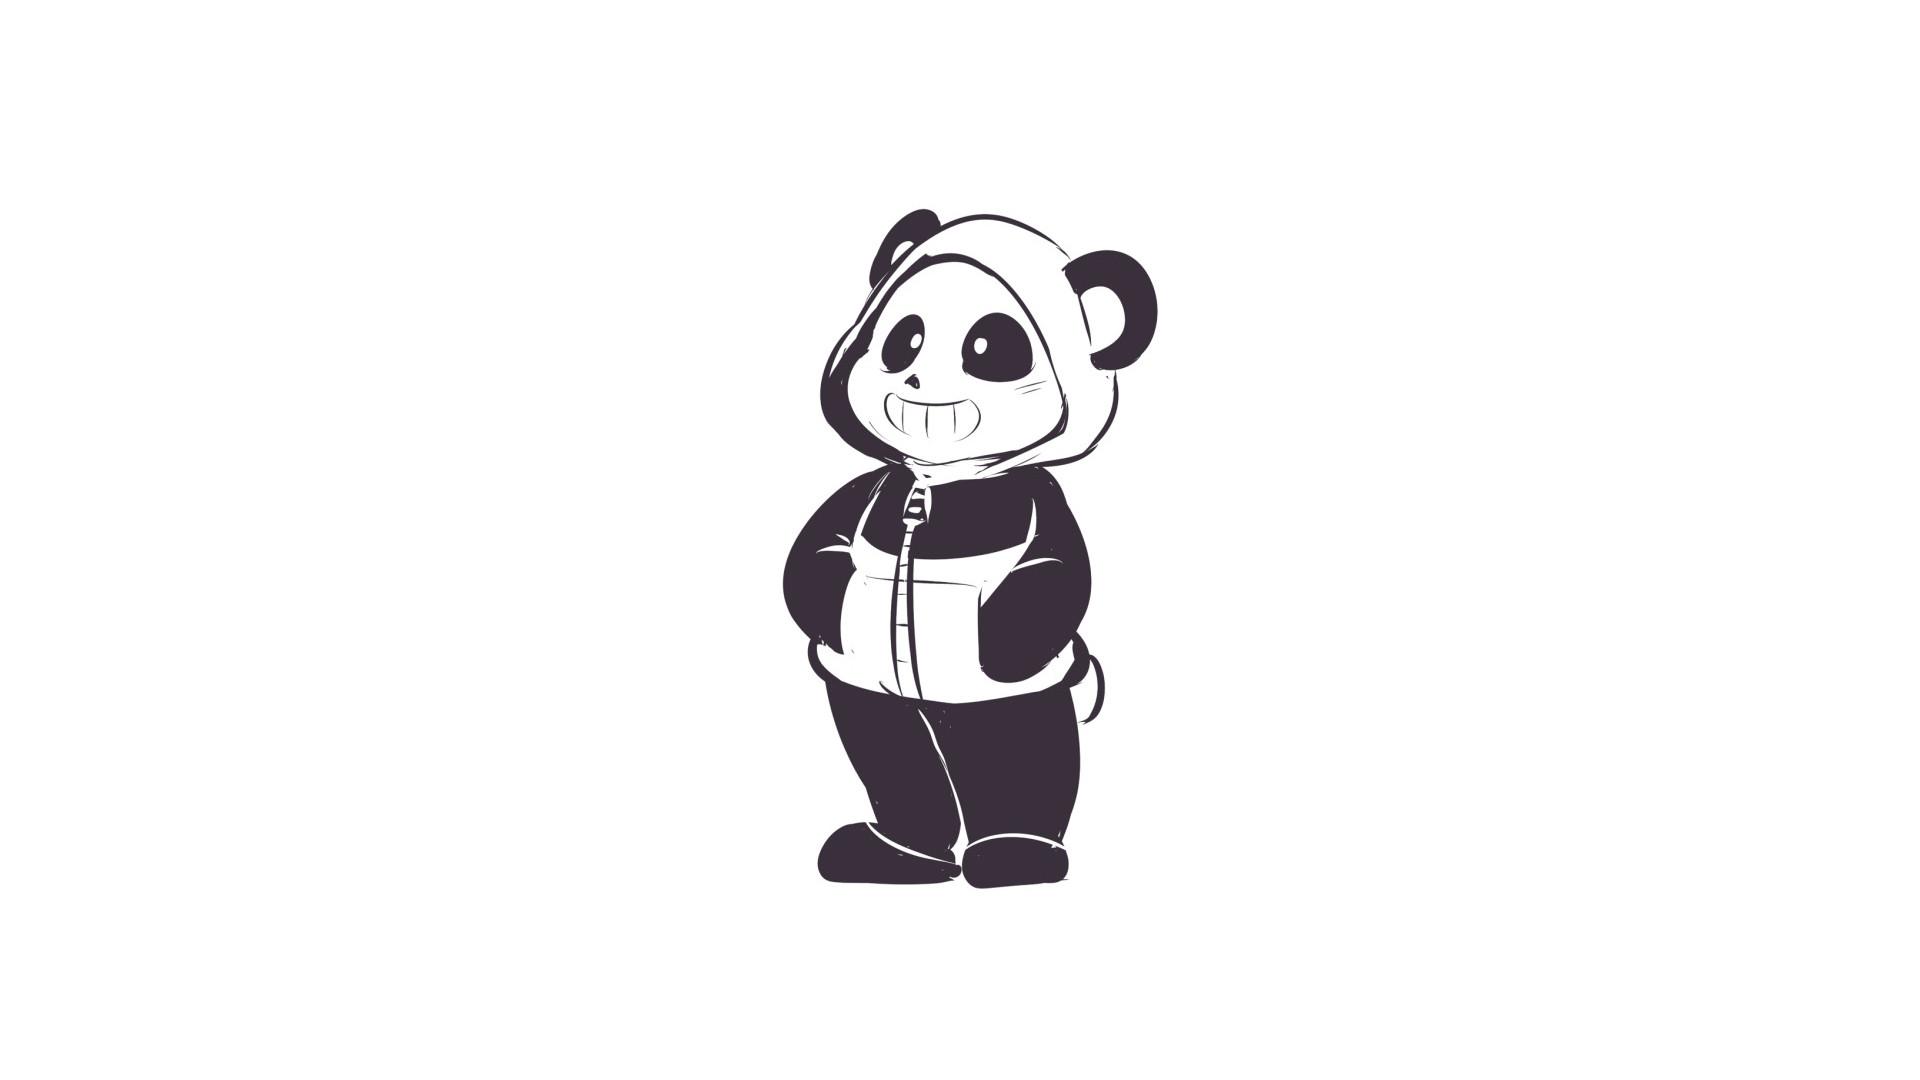 Undertale Panda Sans wallpaper